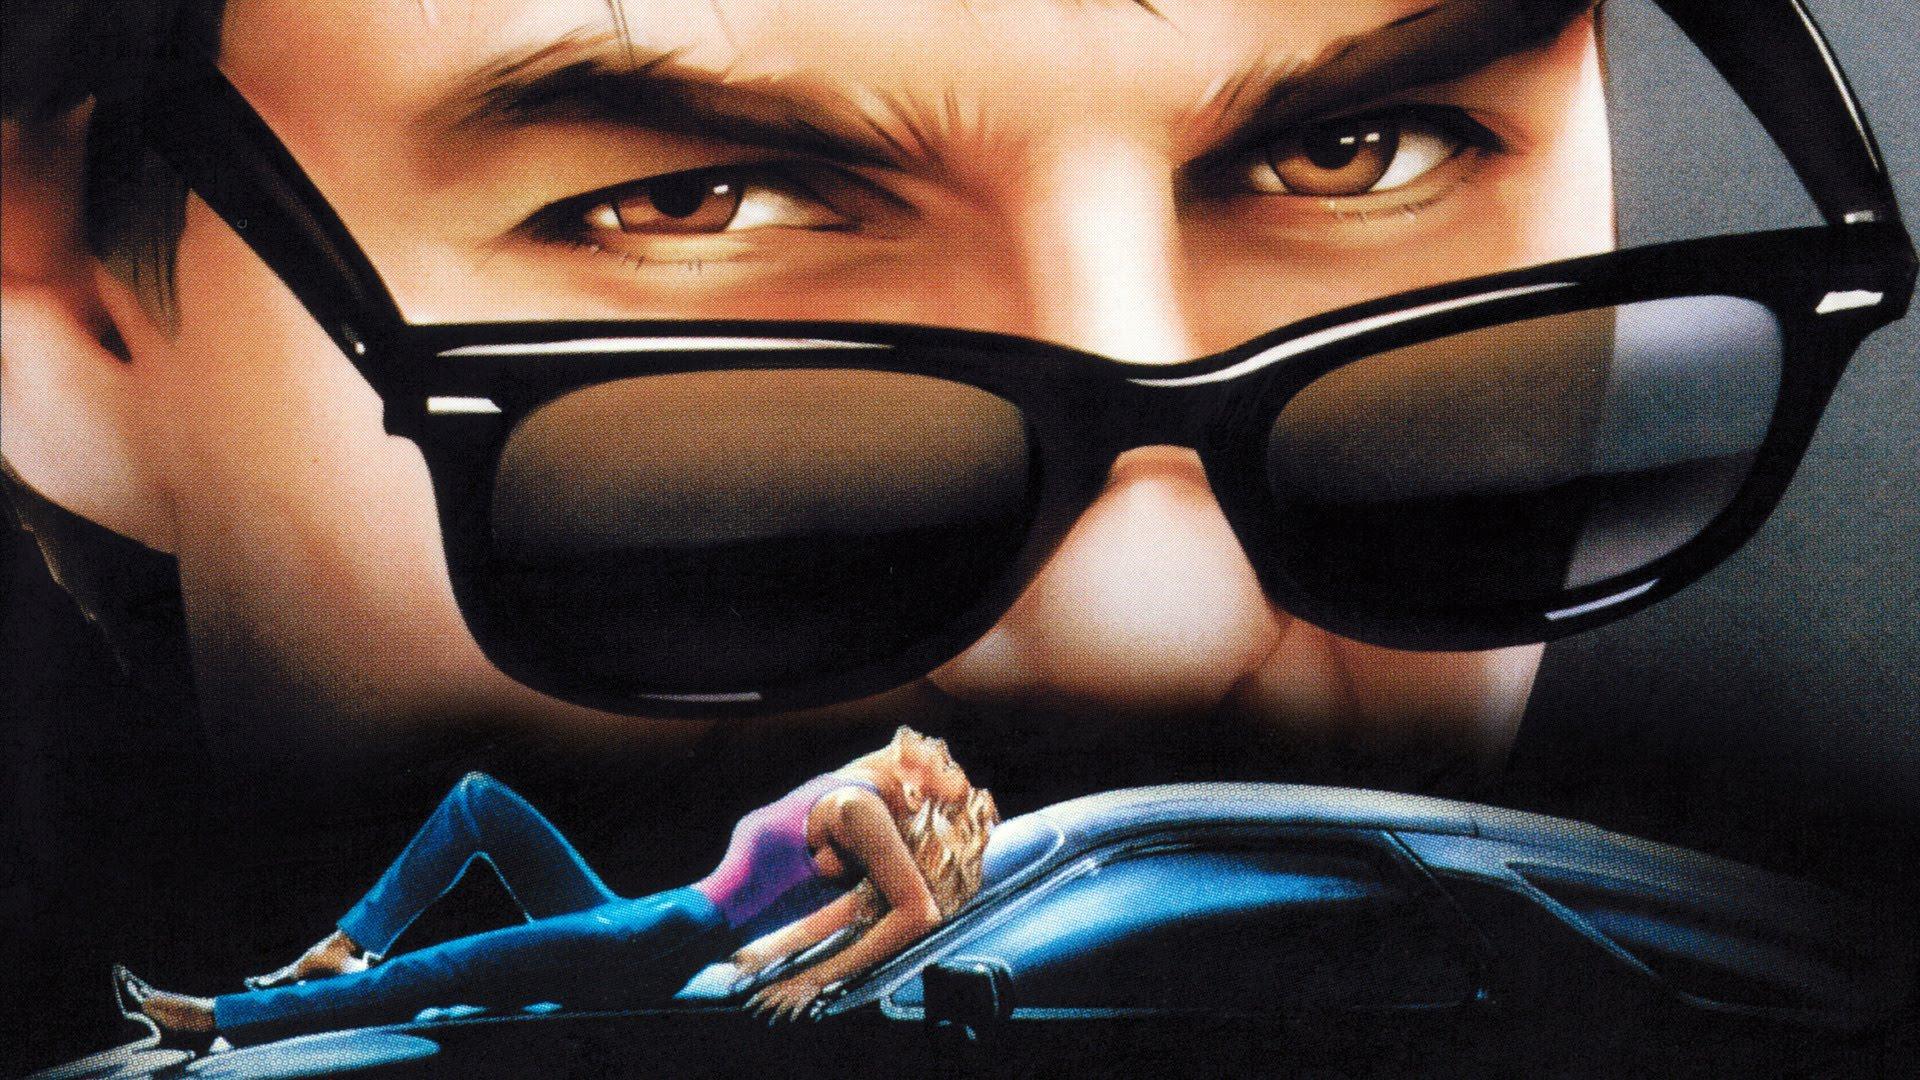 Steam Workshop Risky Business   Tom Cruise 1920x1080